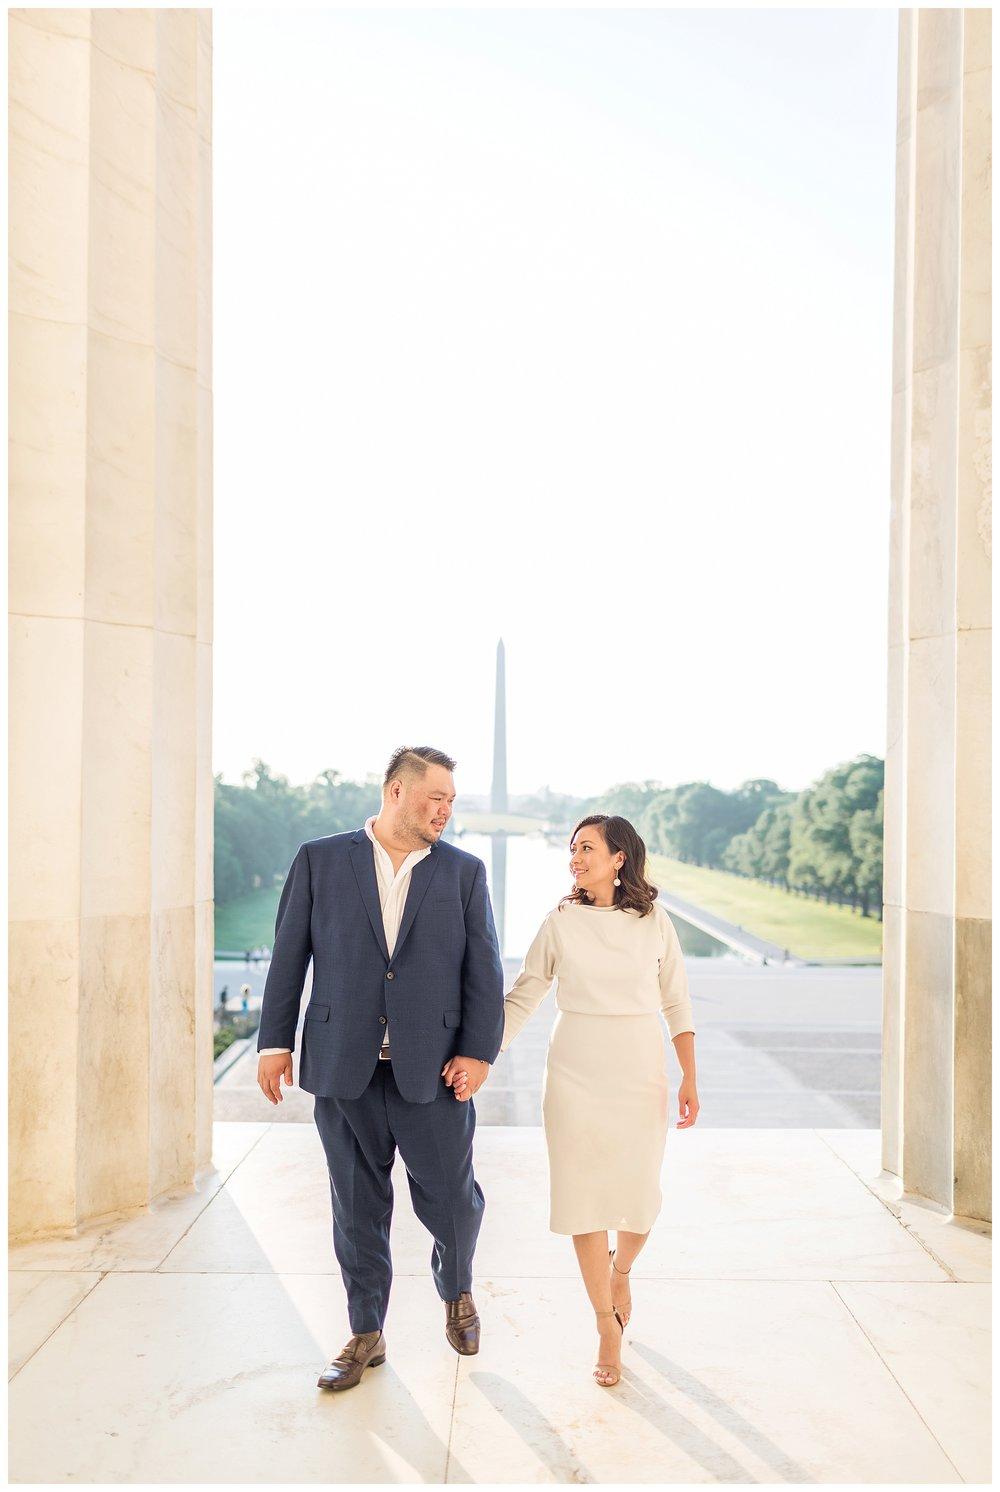 Federal Triangle Engagement DC Wedding Photographer Kir Tuben_0017.jpg